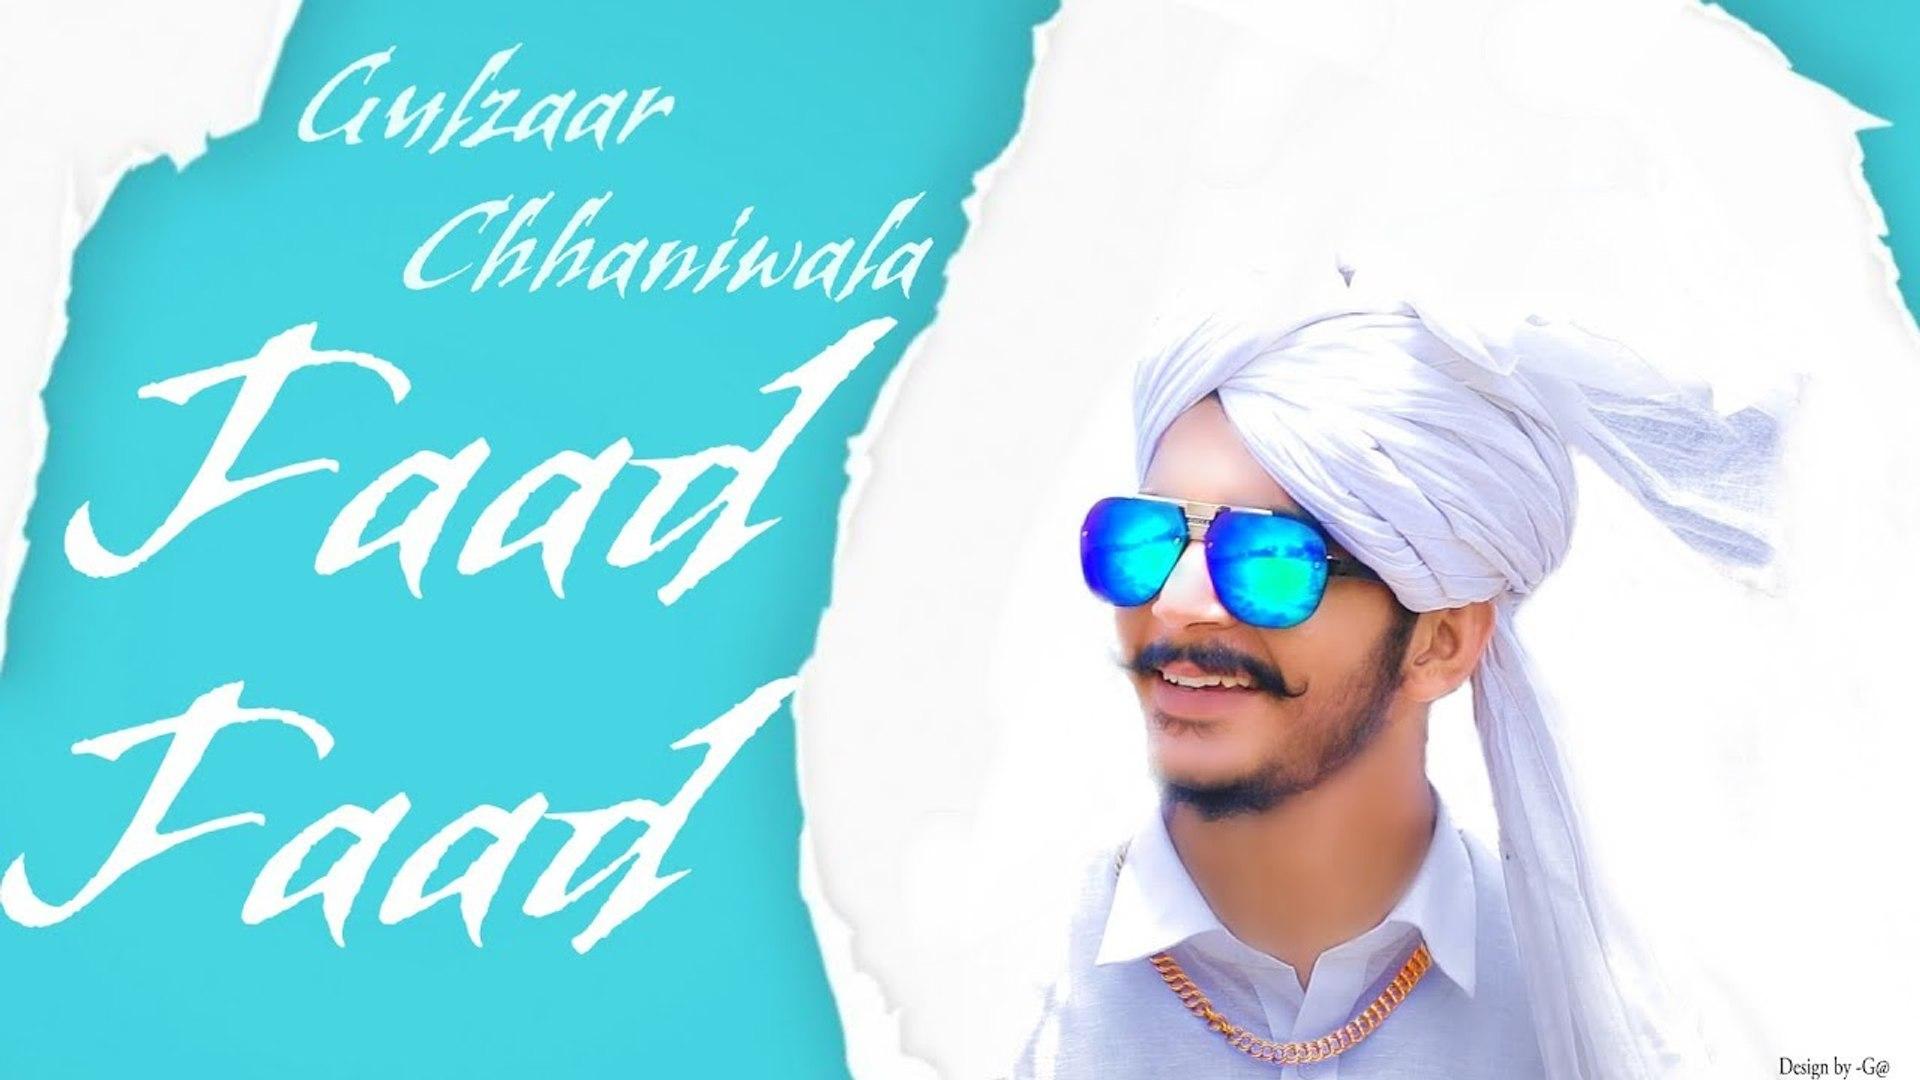 Faad Faad _ Gulzaar Chhaniwala _ Latest Haryanvi Songs Haryanavi 2018 _ New  Haryanvi Song 2018 - YouTube (720p)